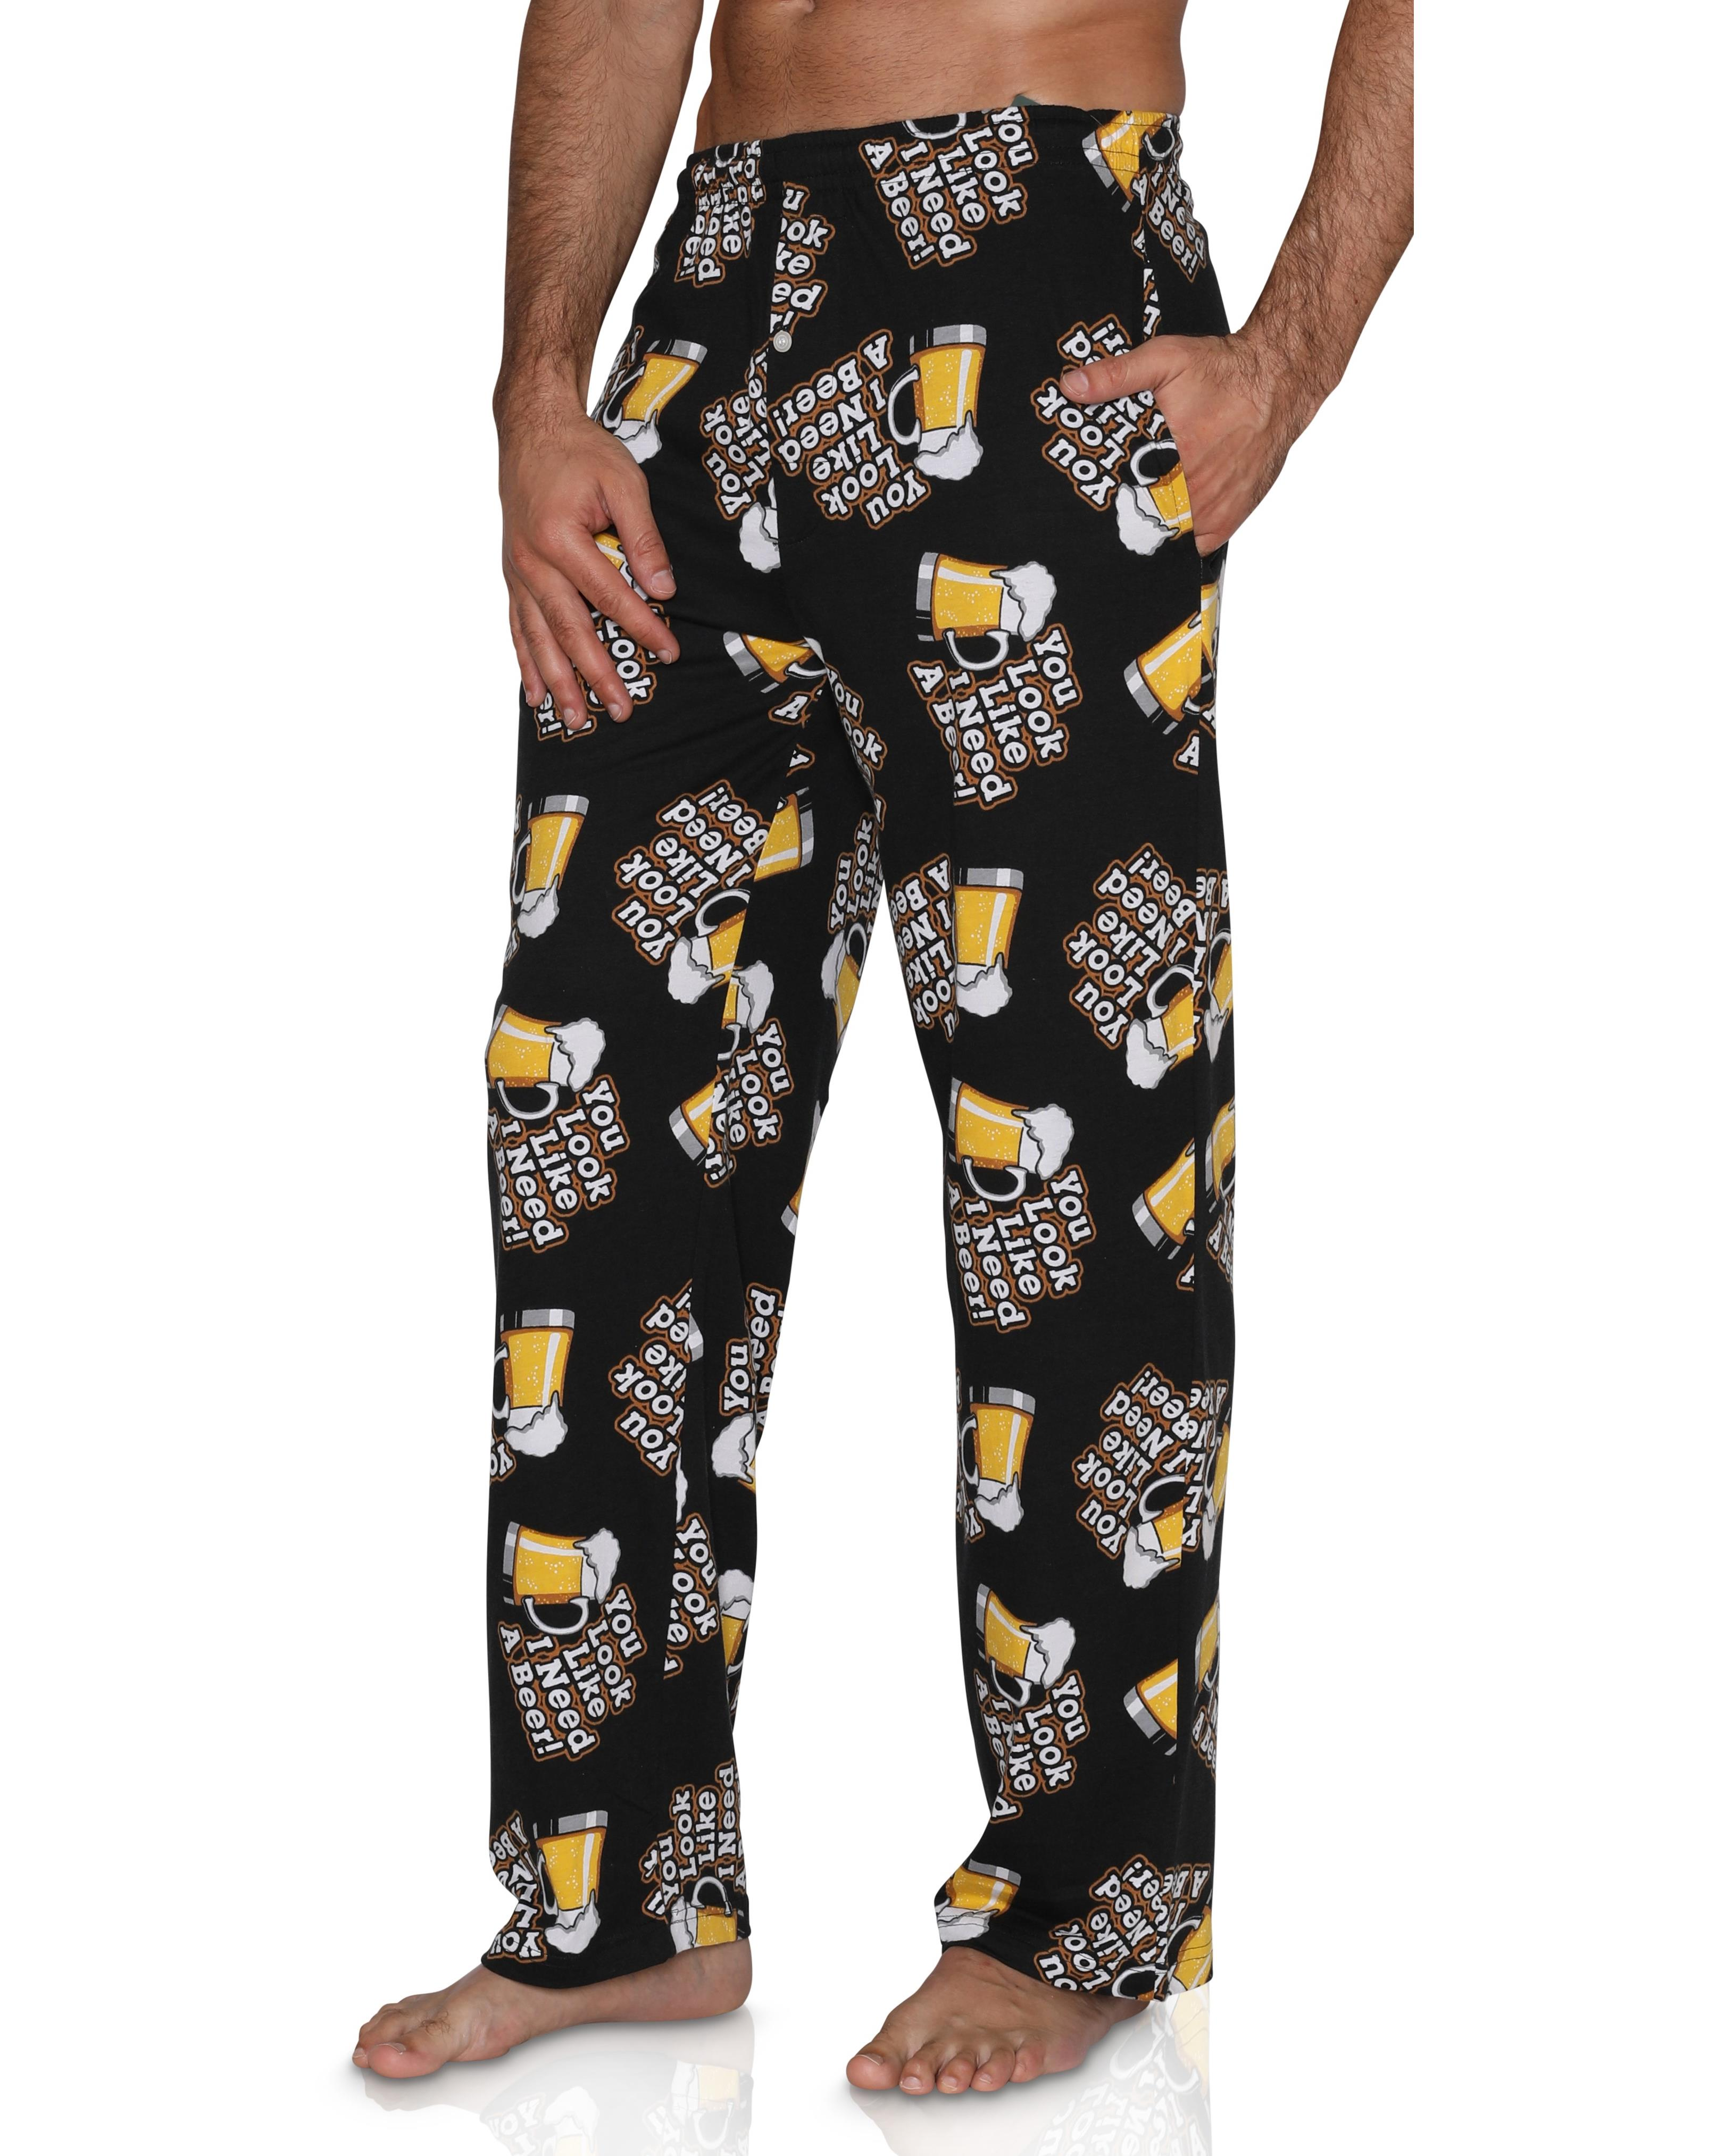 CafePress Pug Pals Unisex Novelty Cotton Pajama Set Comfortable PJ Sleepwear